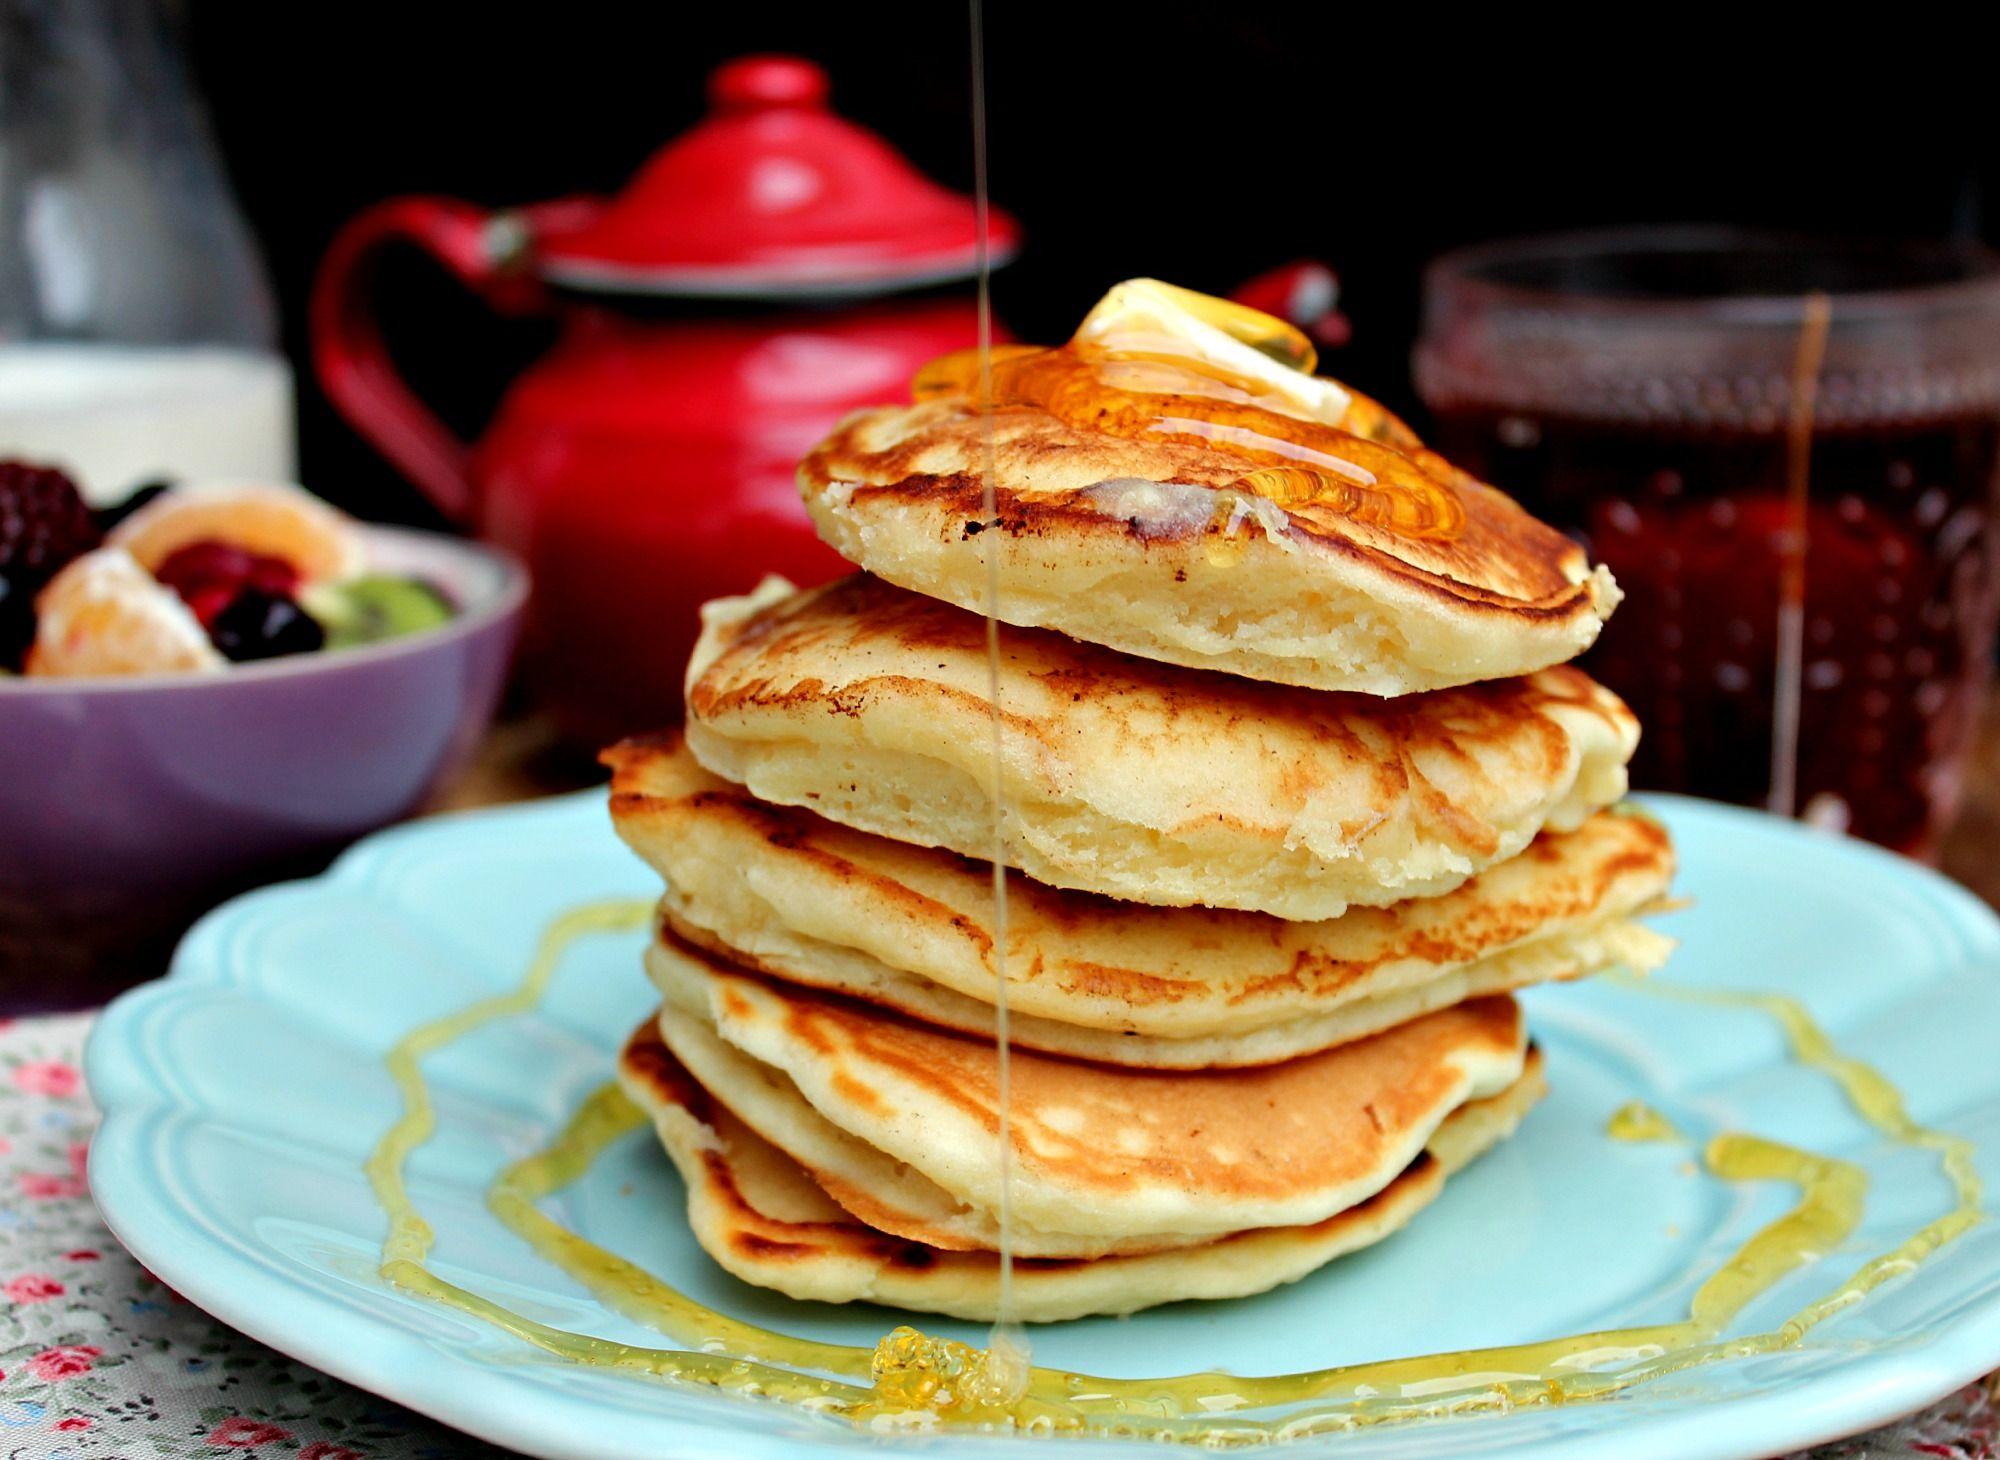 Old Fashioned Buttermilk Pancakes Earthly Taste Homemade Butter Food Breakfast Treats